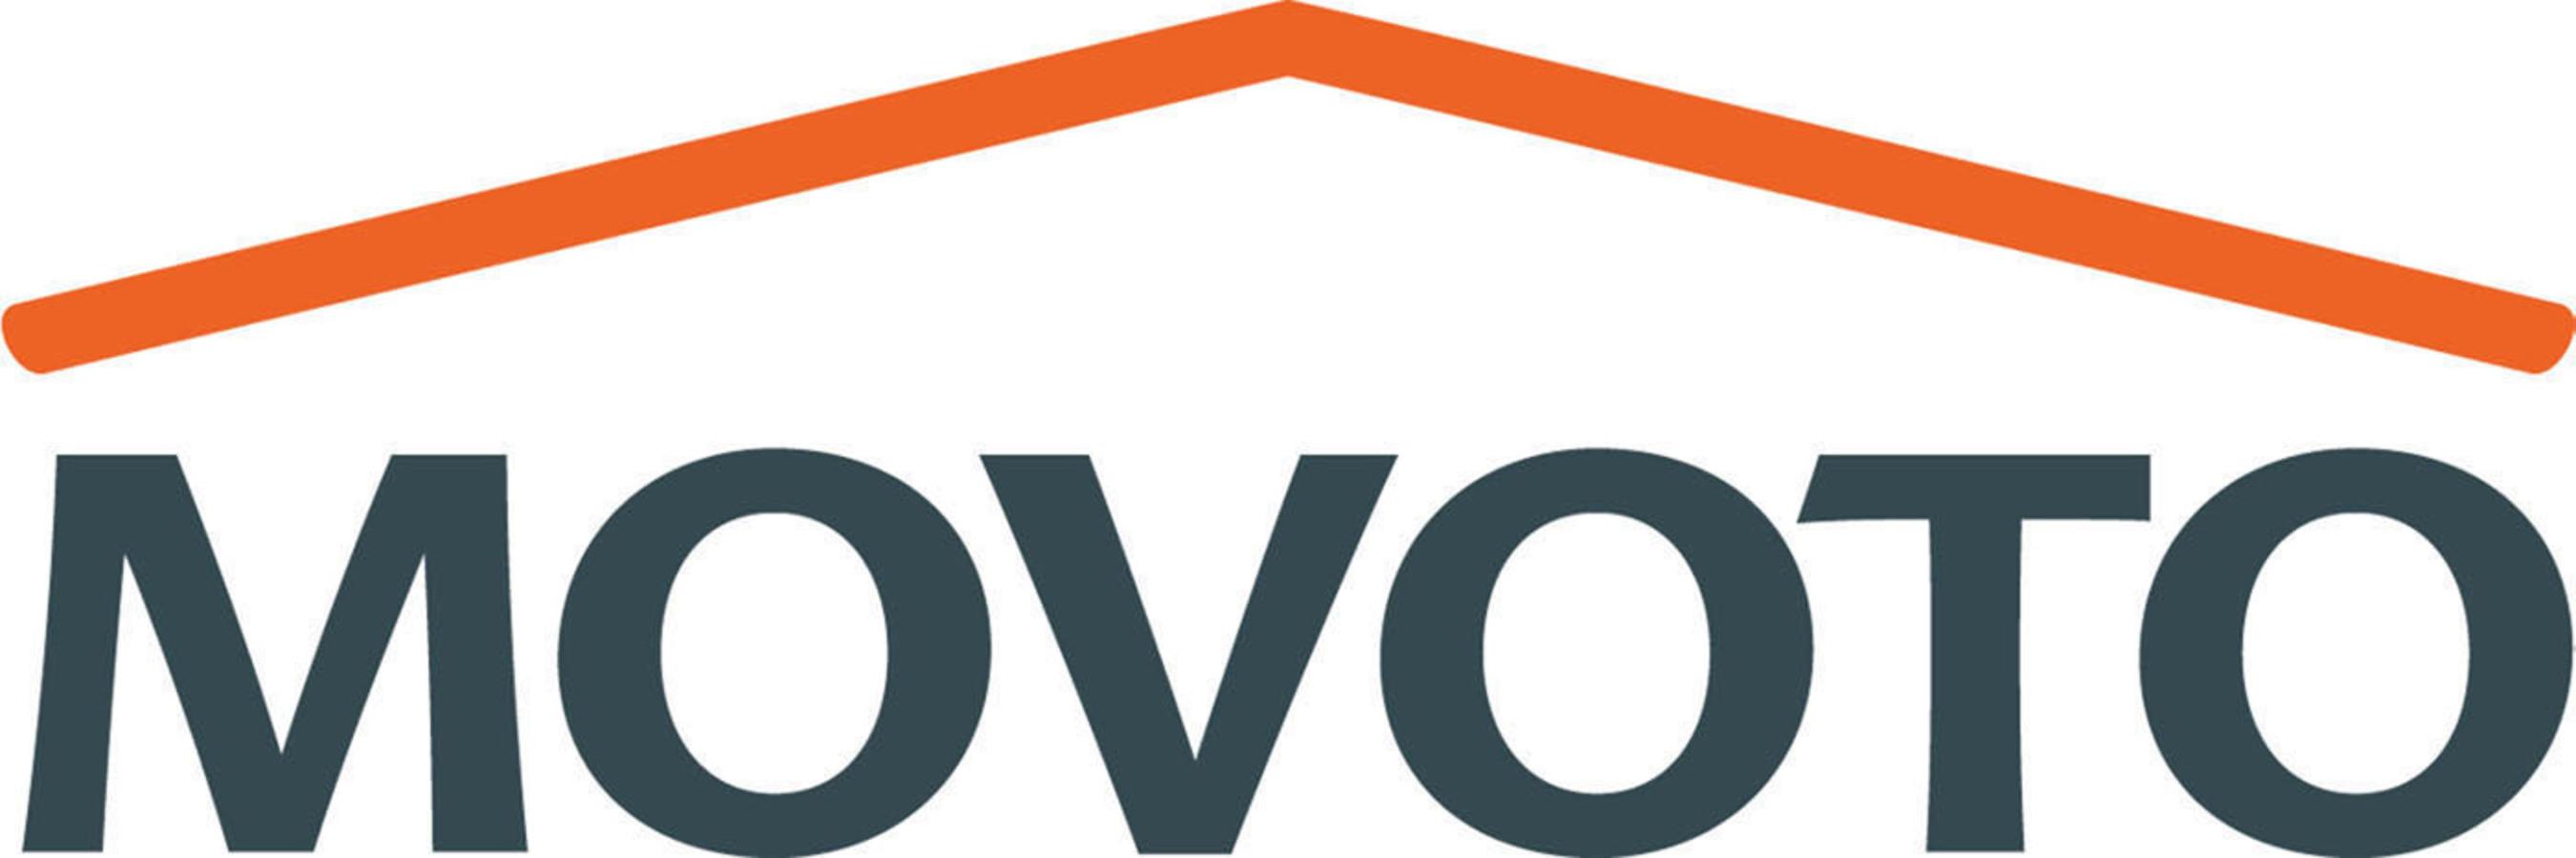 Movoto Online Real Estate.